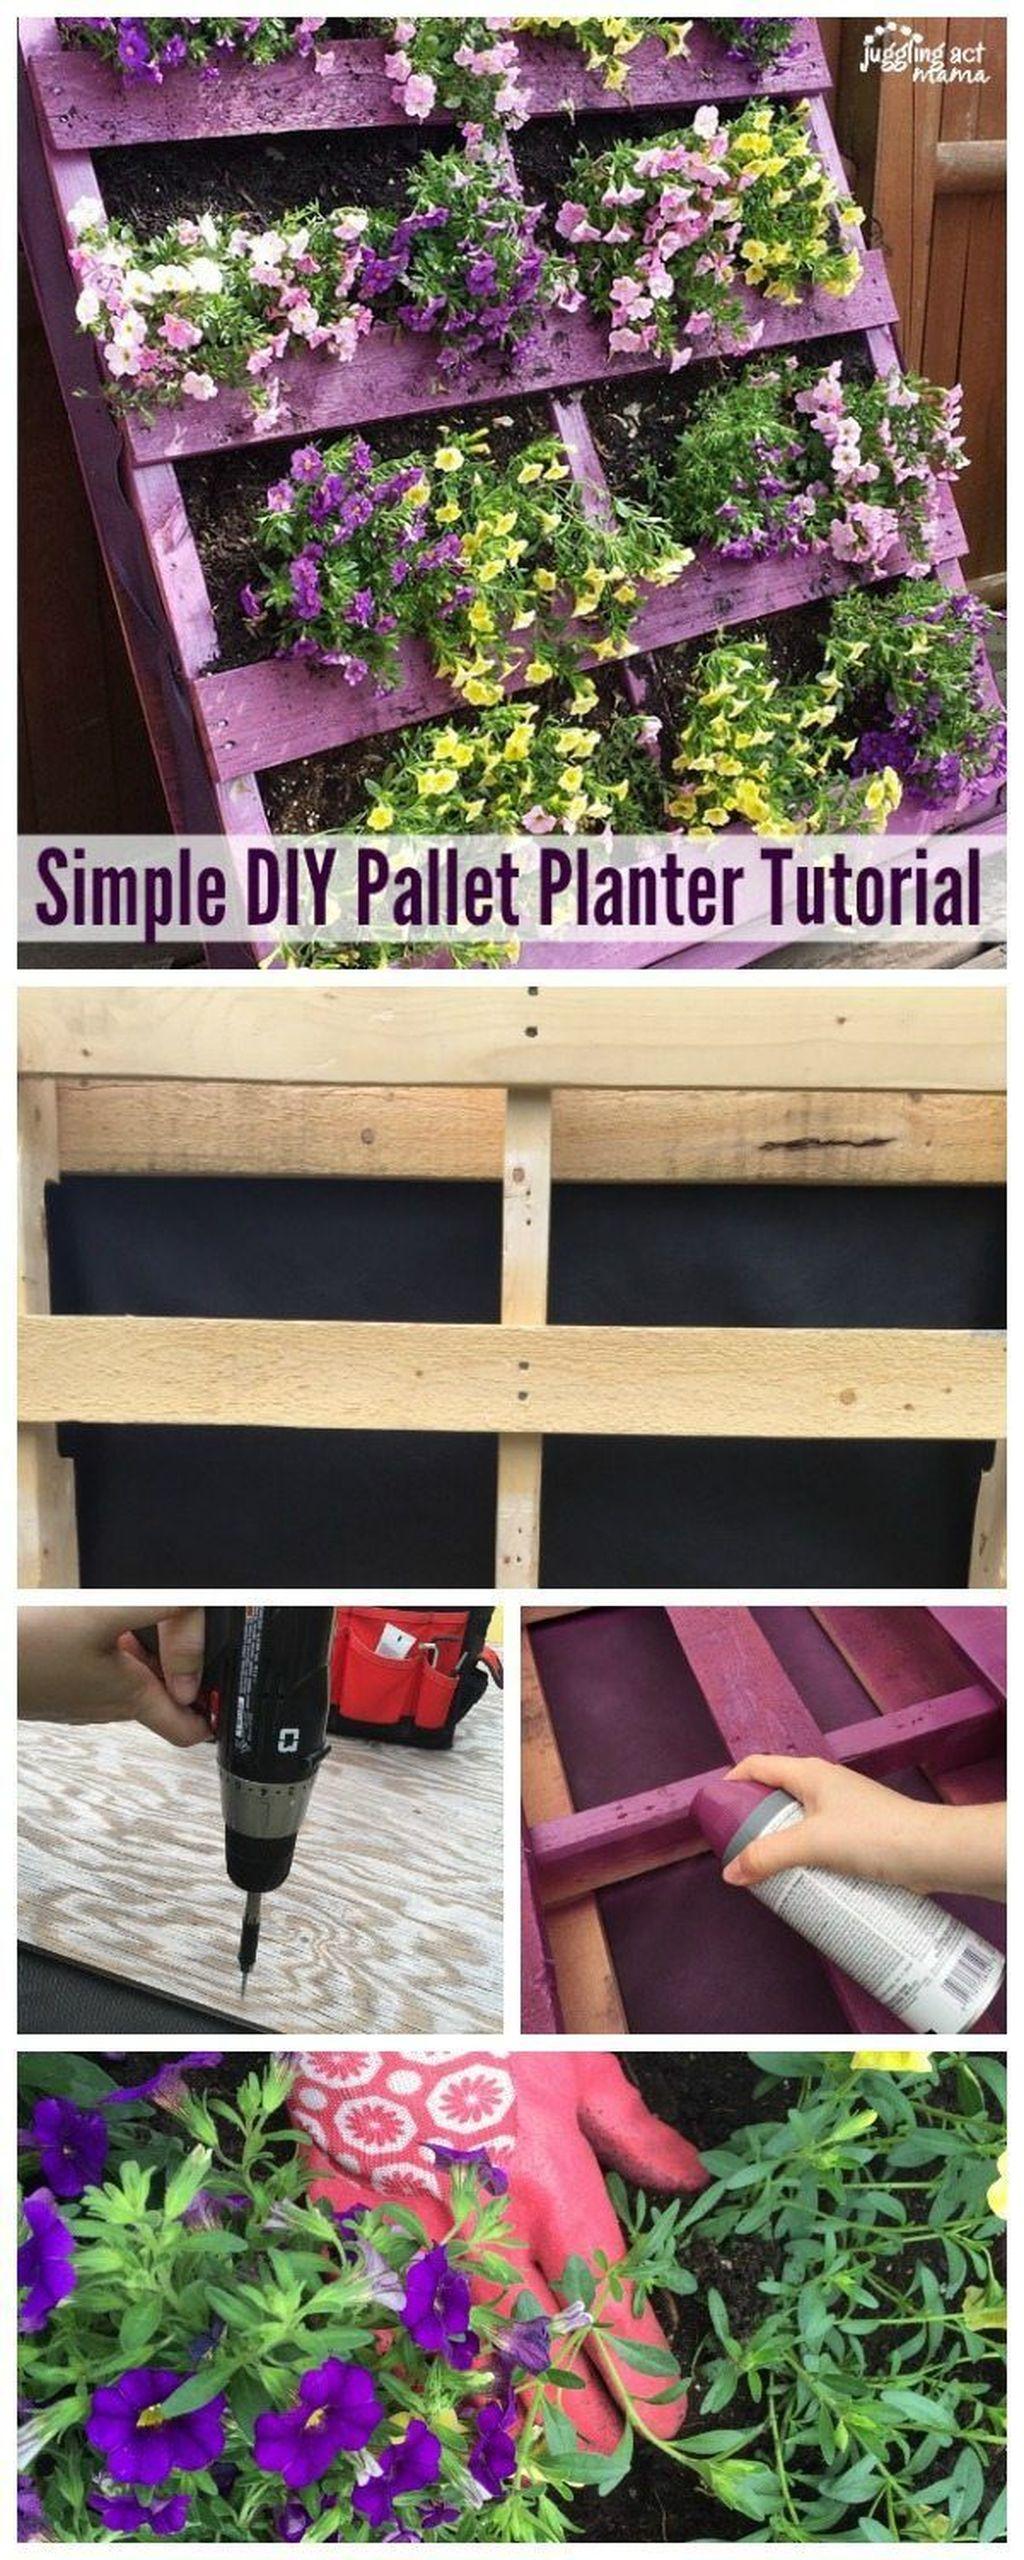 Brilliant Diy Projects Pallet Garden Design Ideas On A Budget 03